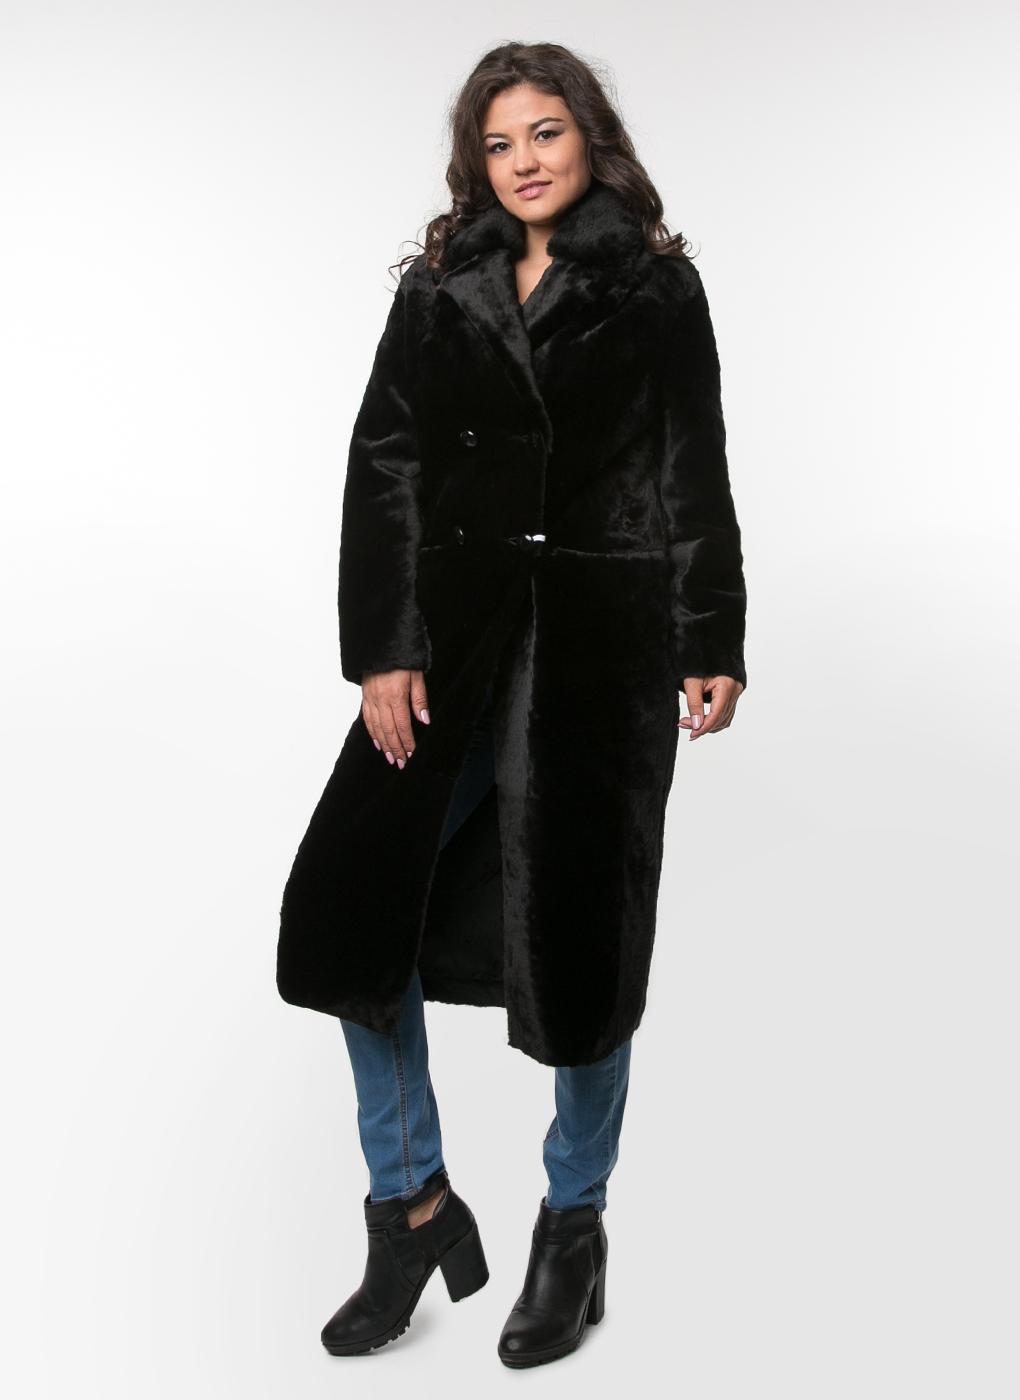 Пальто кокон из овчины 05, Aliance fur фото